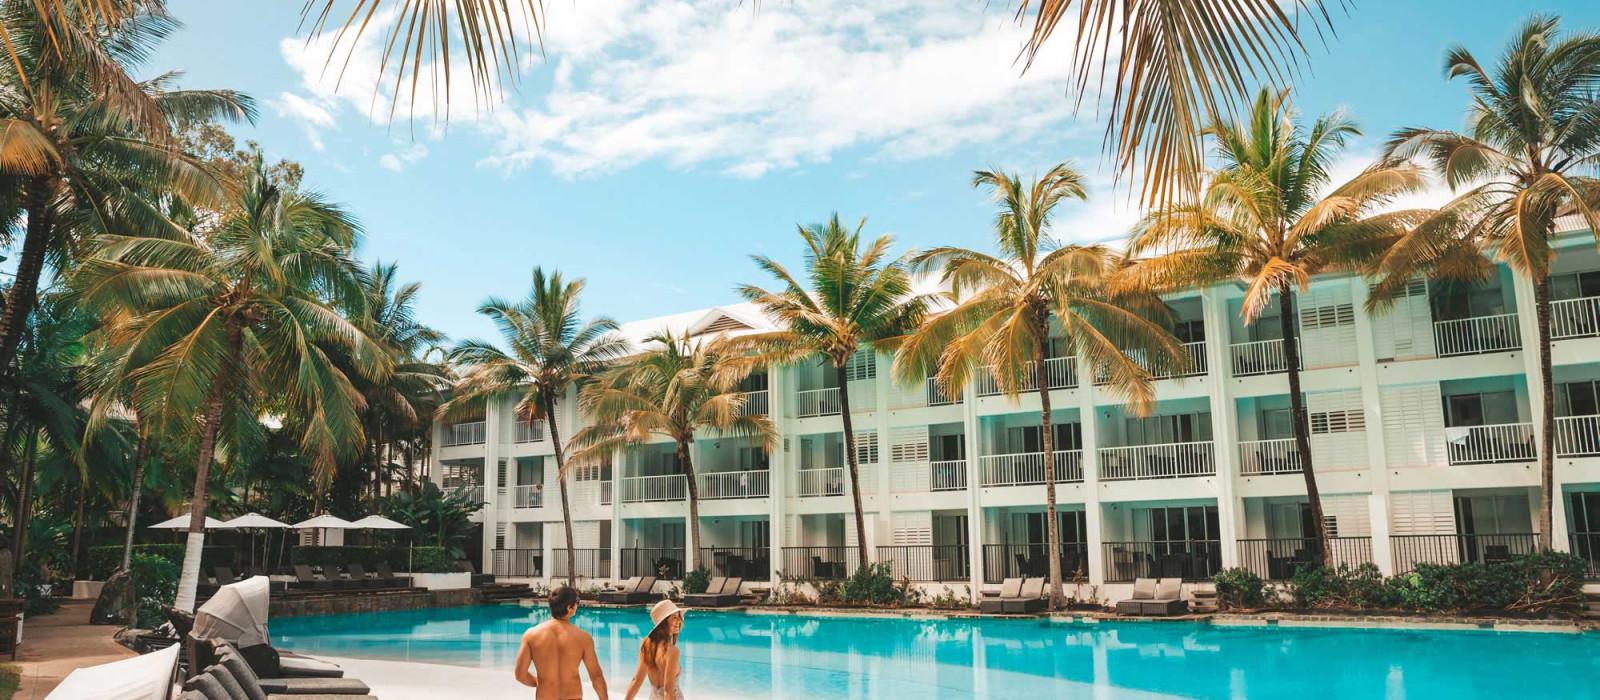 Hotel Peppers Beach Club Australien